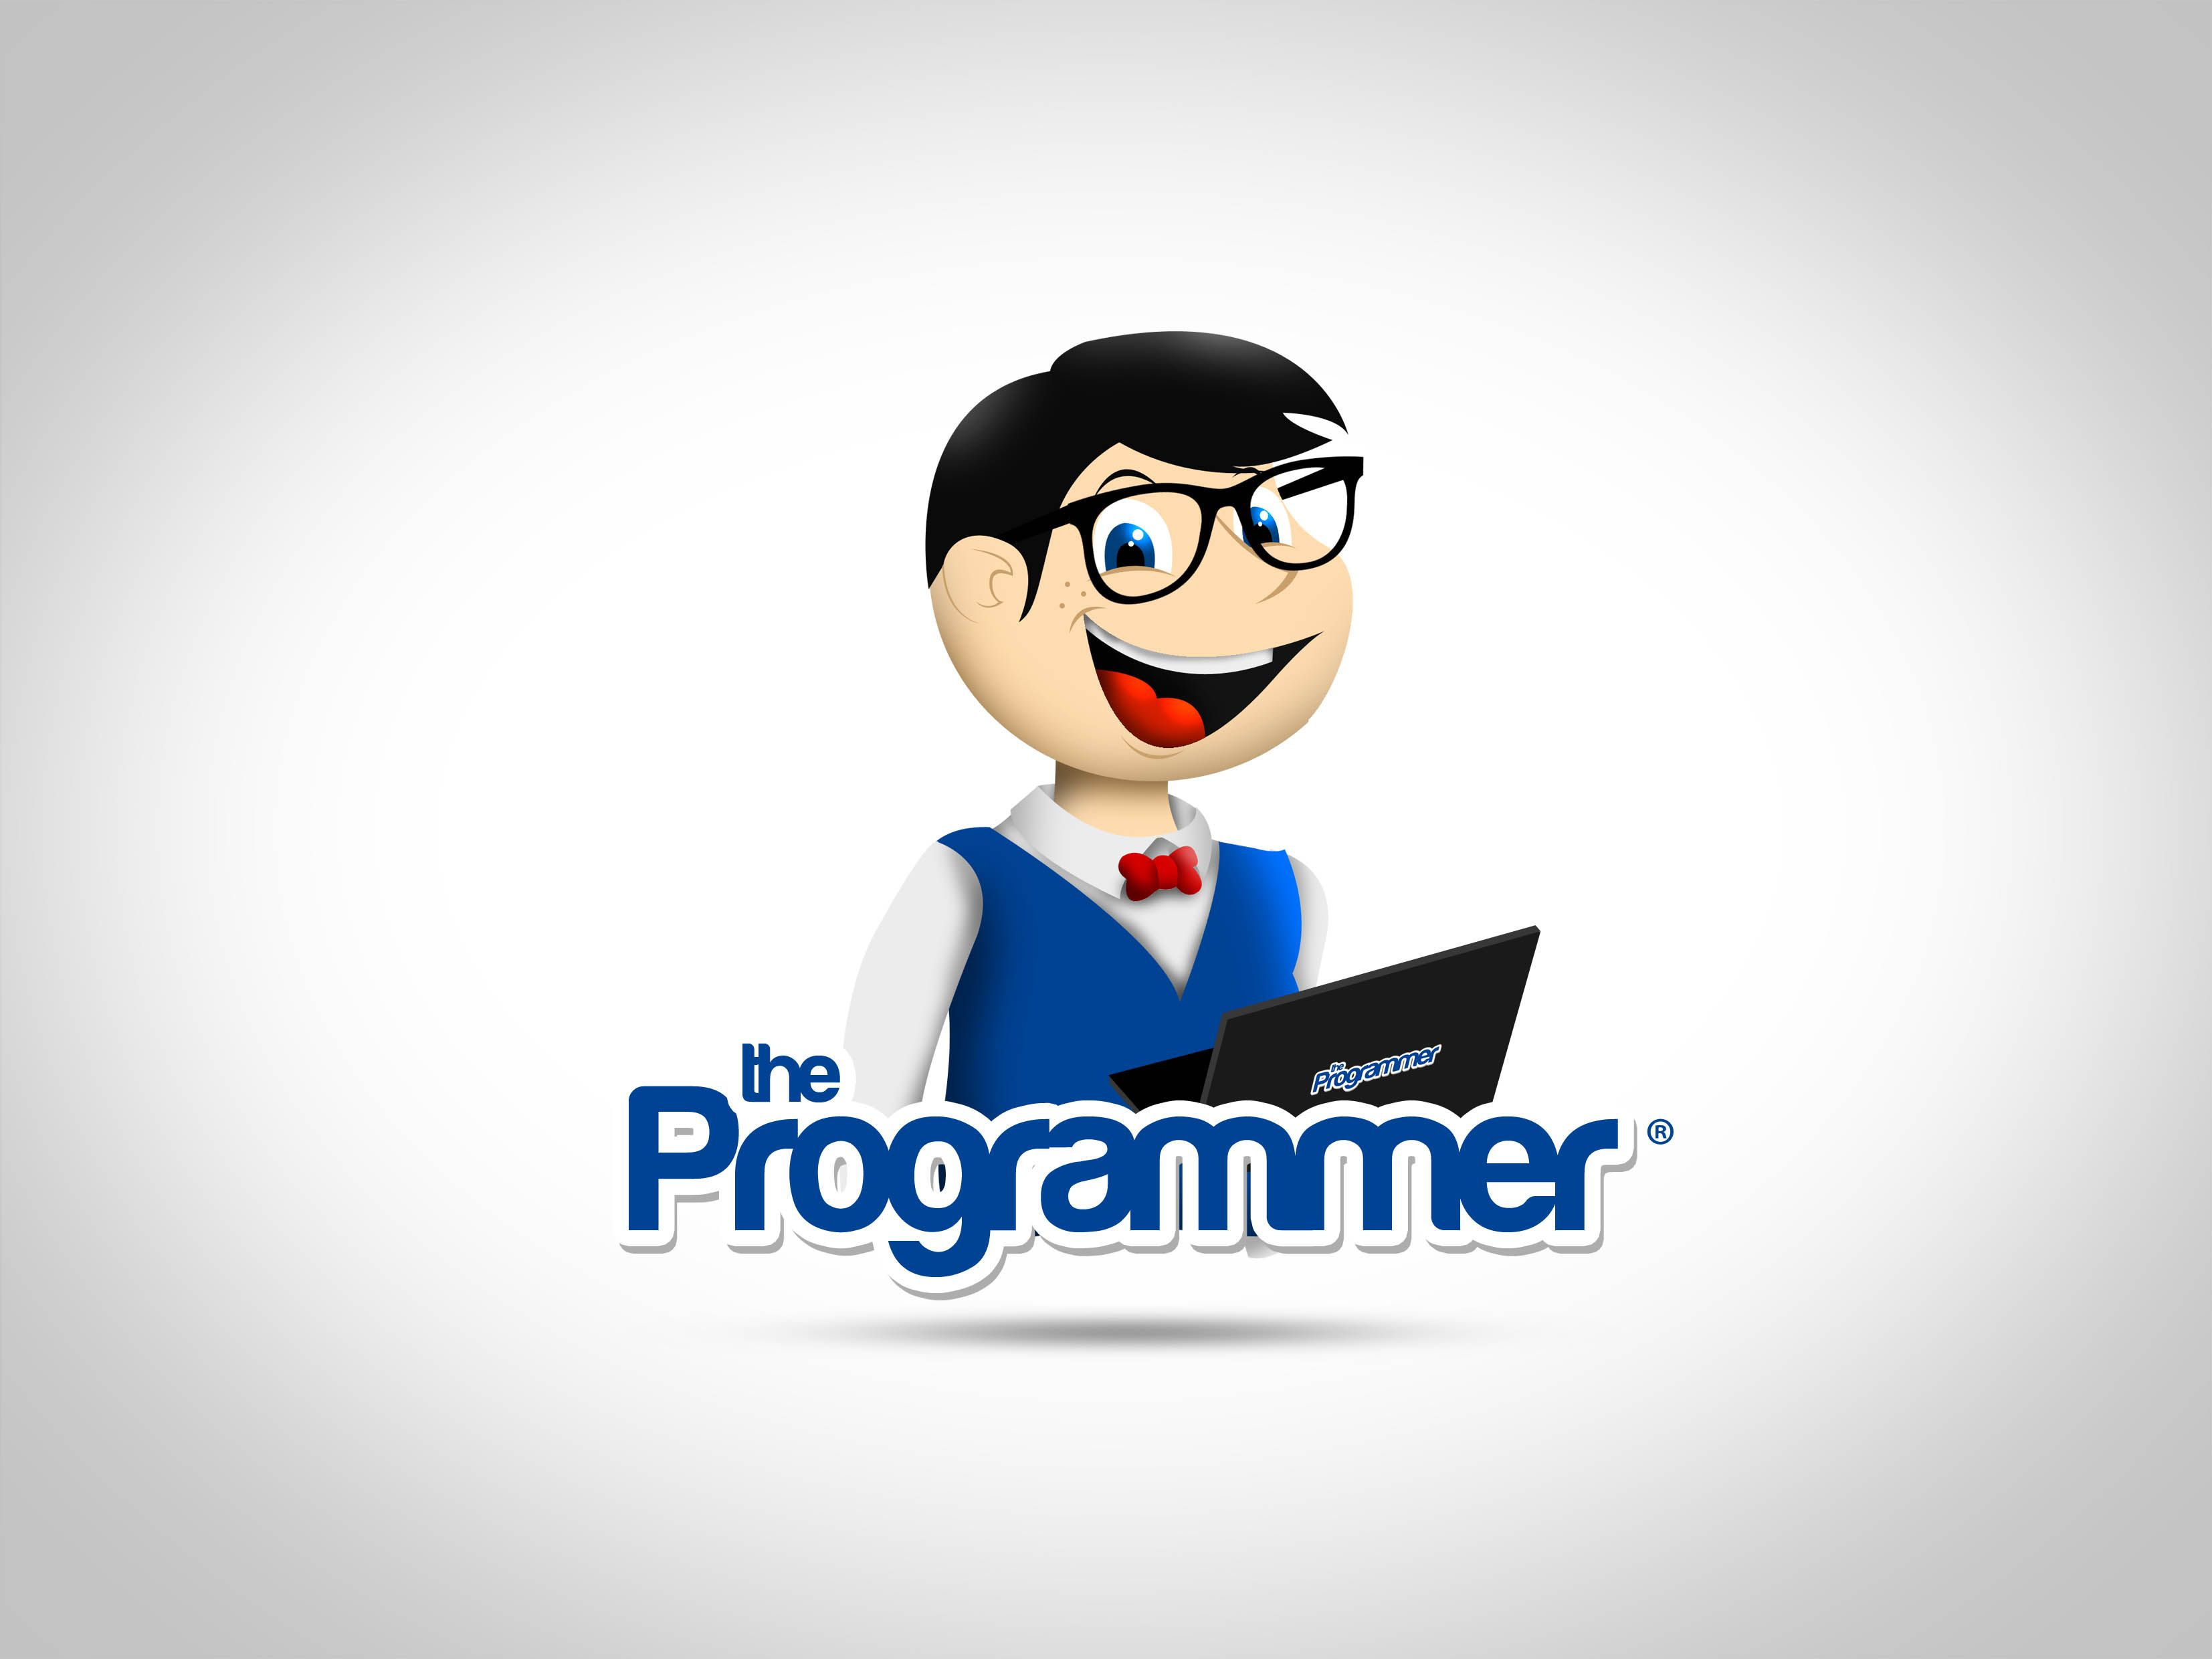 programmer logo logodix programmer logo logodix